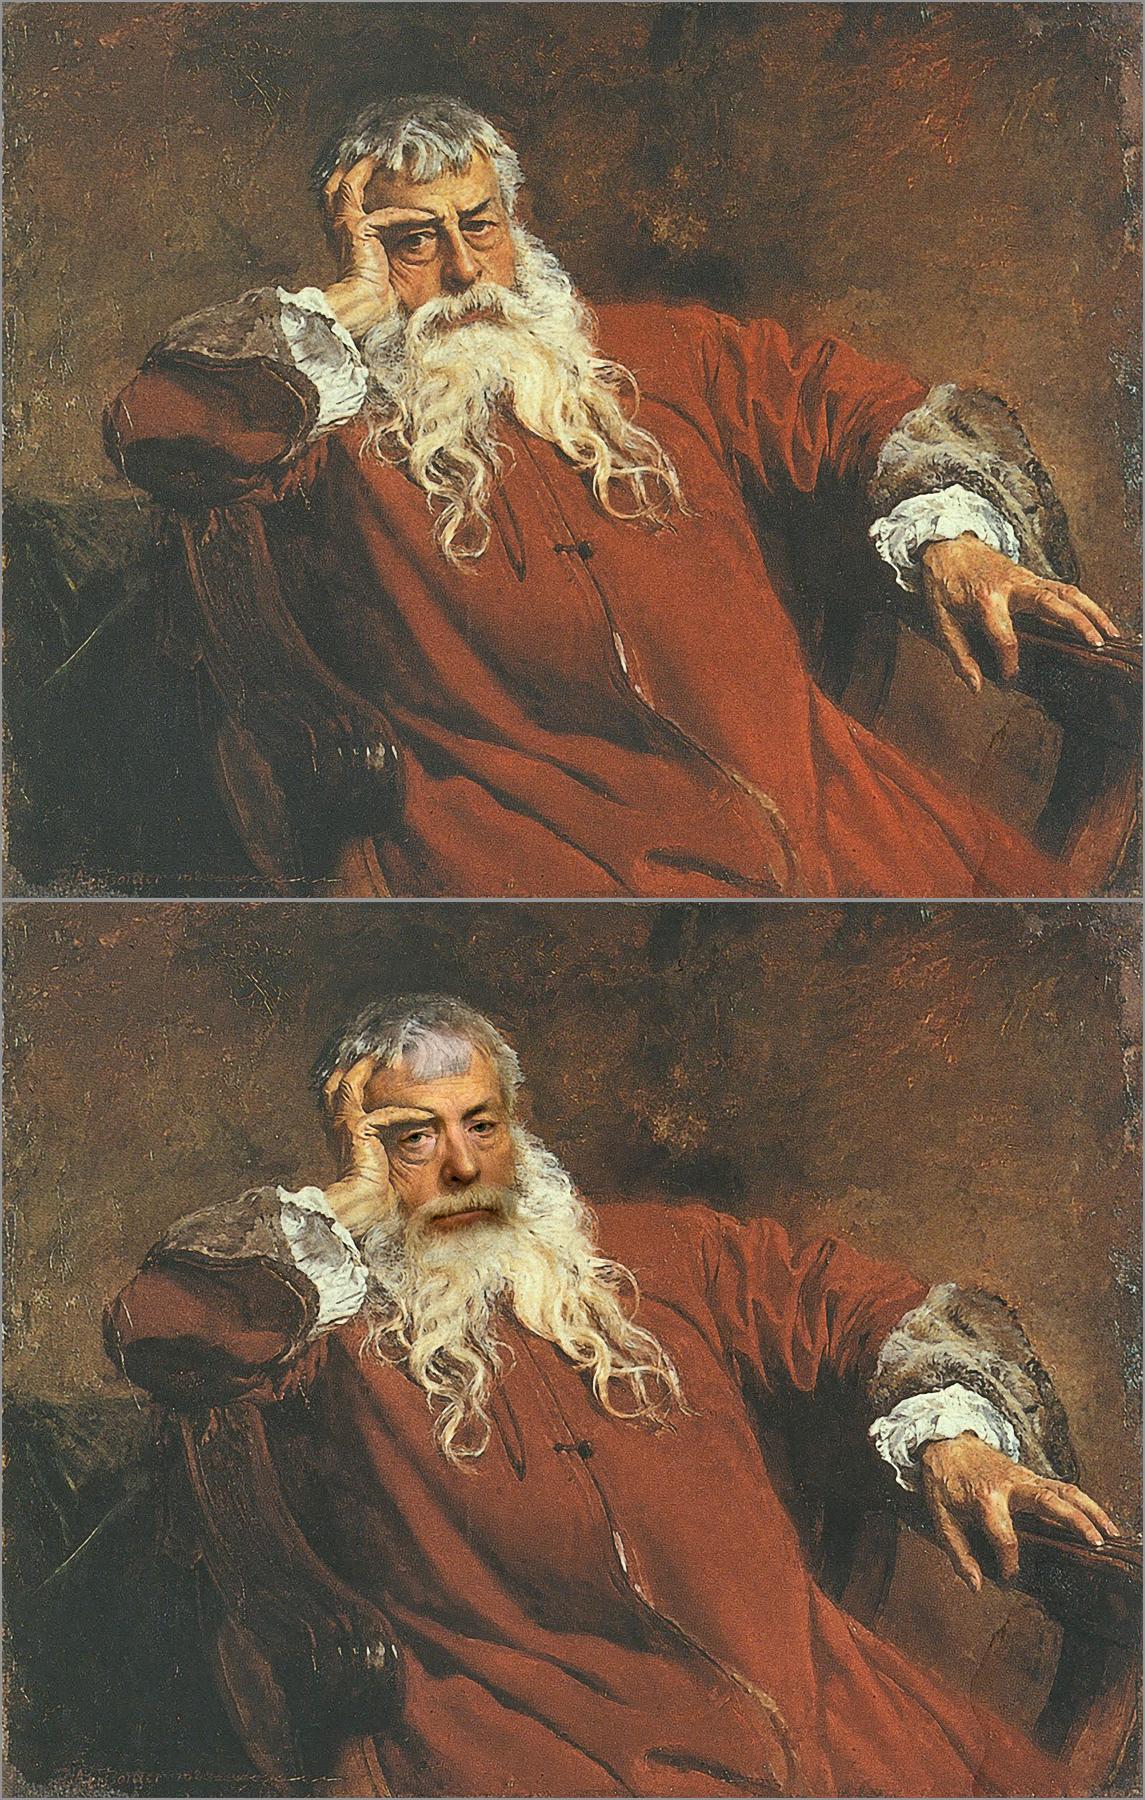 Jean-Louis-Ernest Meissonier, Self Portrait, 1881, Chris Golson.